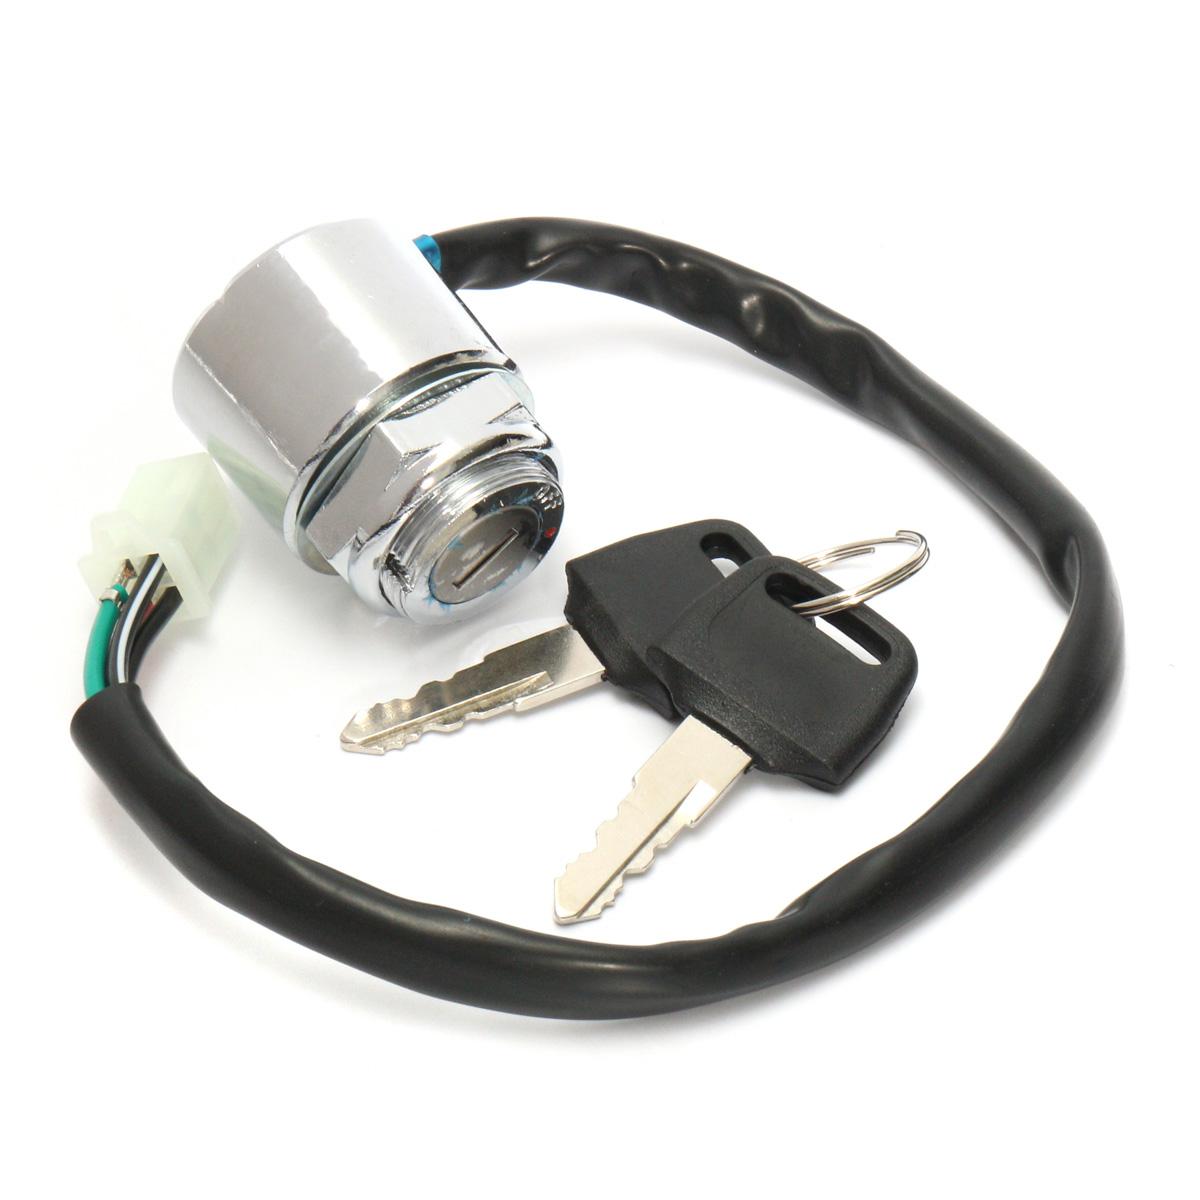 110cc Atv Key Switch Wiring Electrical Diagrams Starter 4 Wire On Off Ignition 50 70 90 110 125 150 200 Cc Suzuki